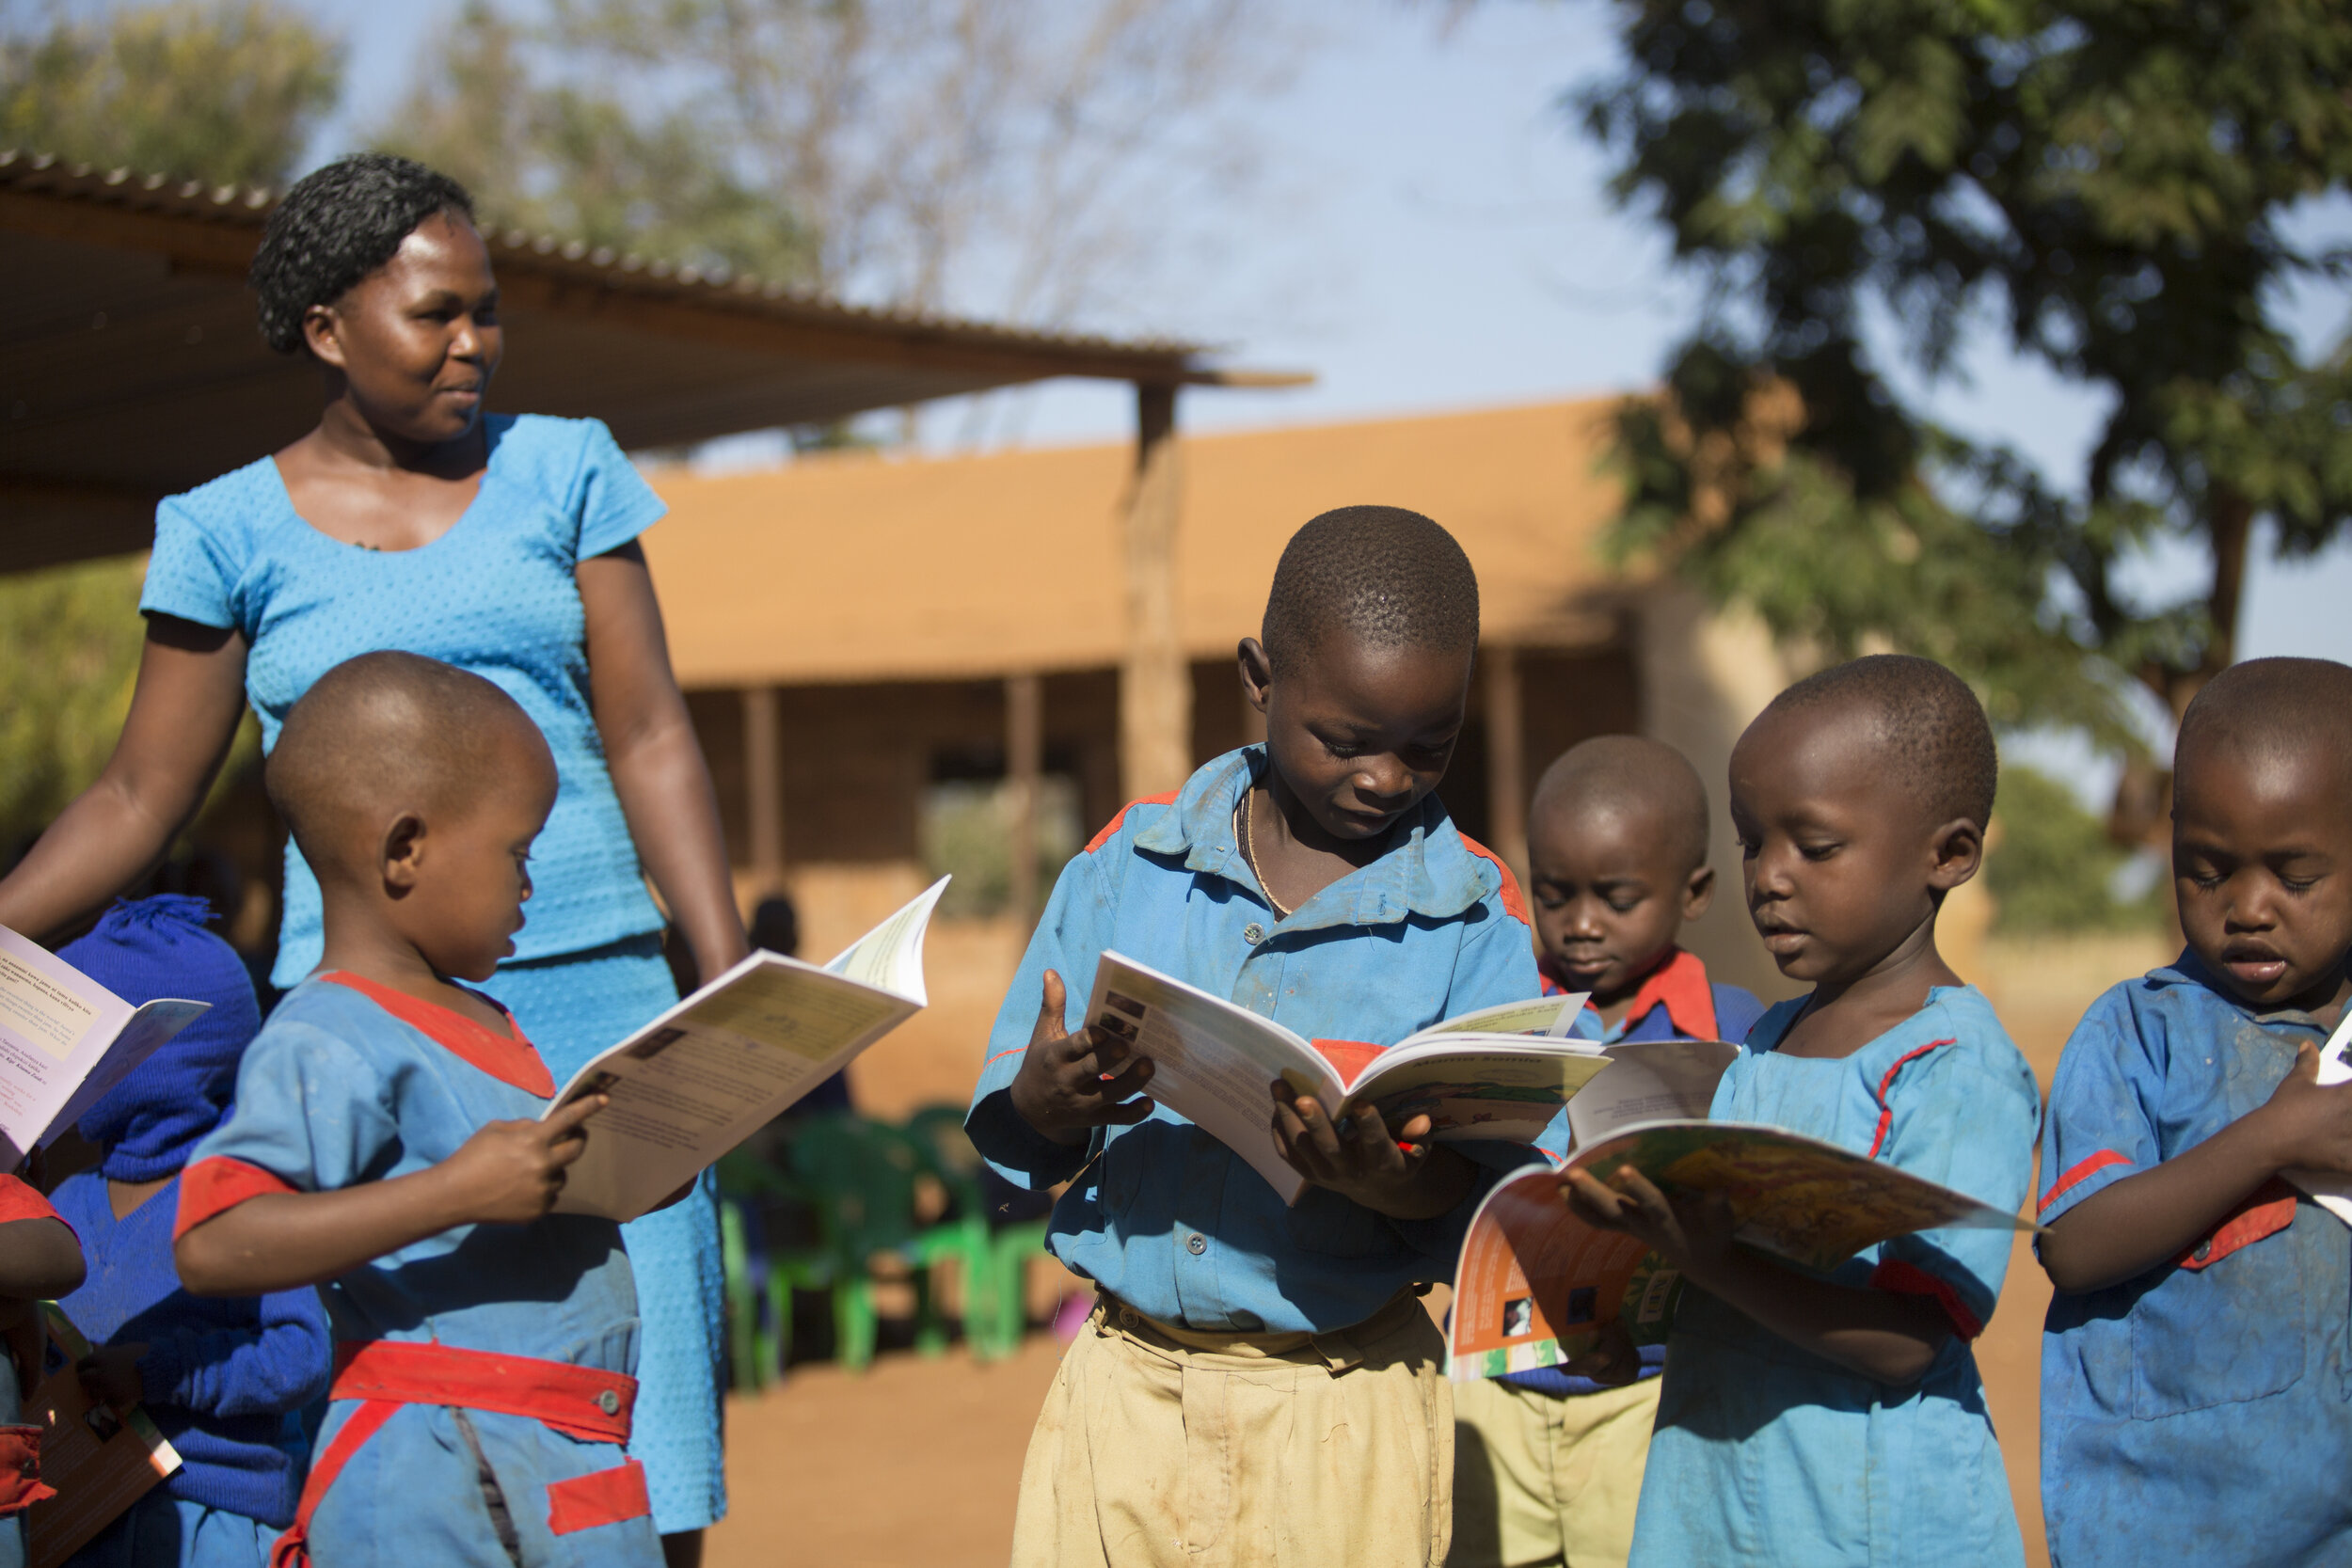 elsas_kopje_-_community_-_conservation_education_at_ura_gate_primary_csilverless-16.jpg